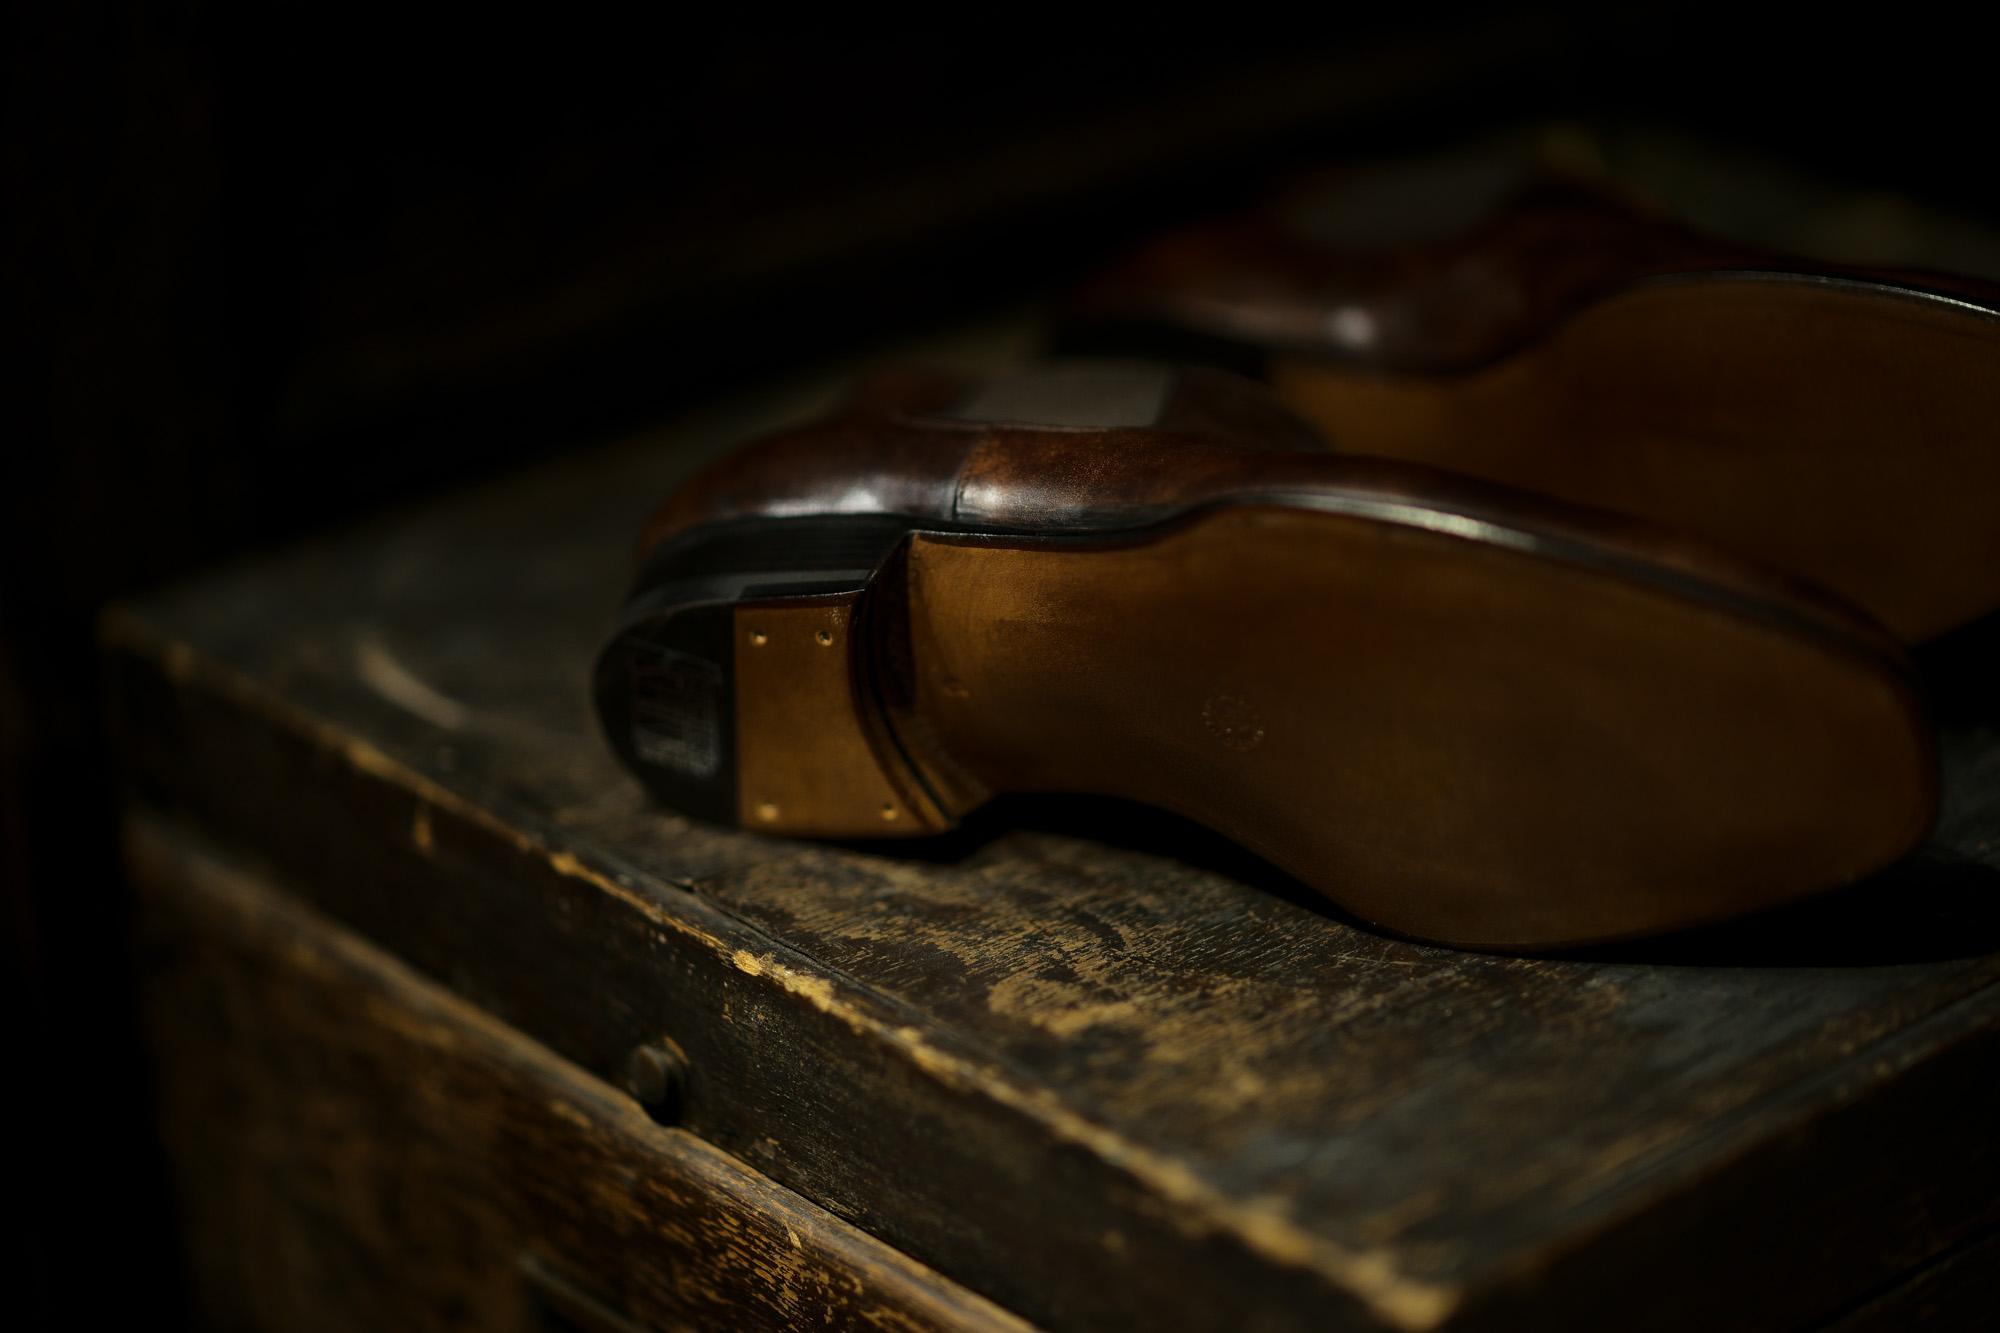 ENZO BONAFE (エンツォボナフェ) CARY GRANT III(ゲーリーグラント3)  MUSEUM CALF(ミュージアムカーフ)  Side gore Boots サイドゴアブーツ DARK BROWN(ダークブラウン) made in italy (イタリア製) 愛知 名古屋 altoediritto アルトエデリット